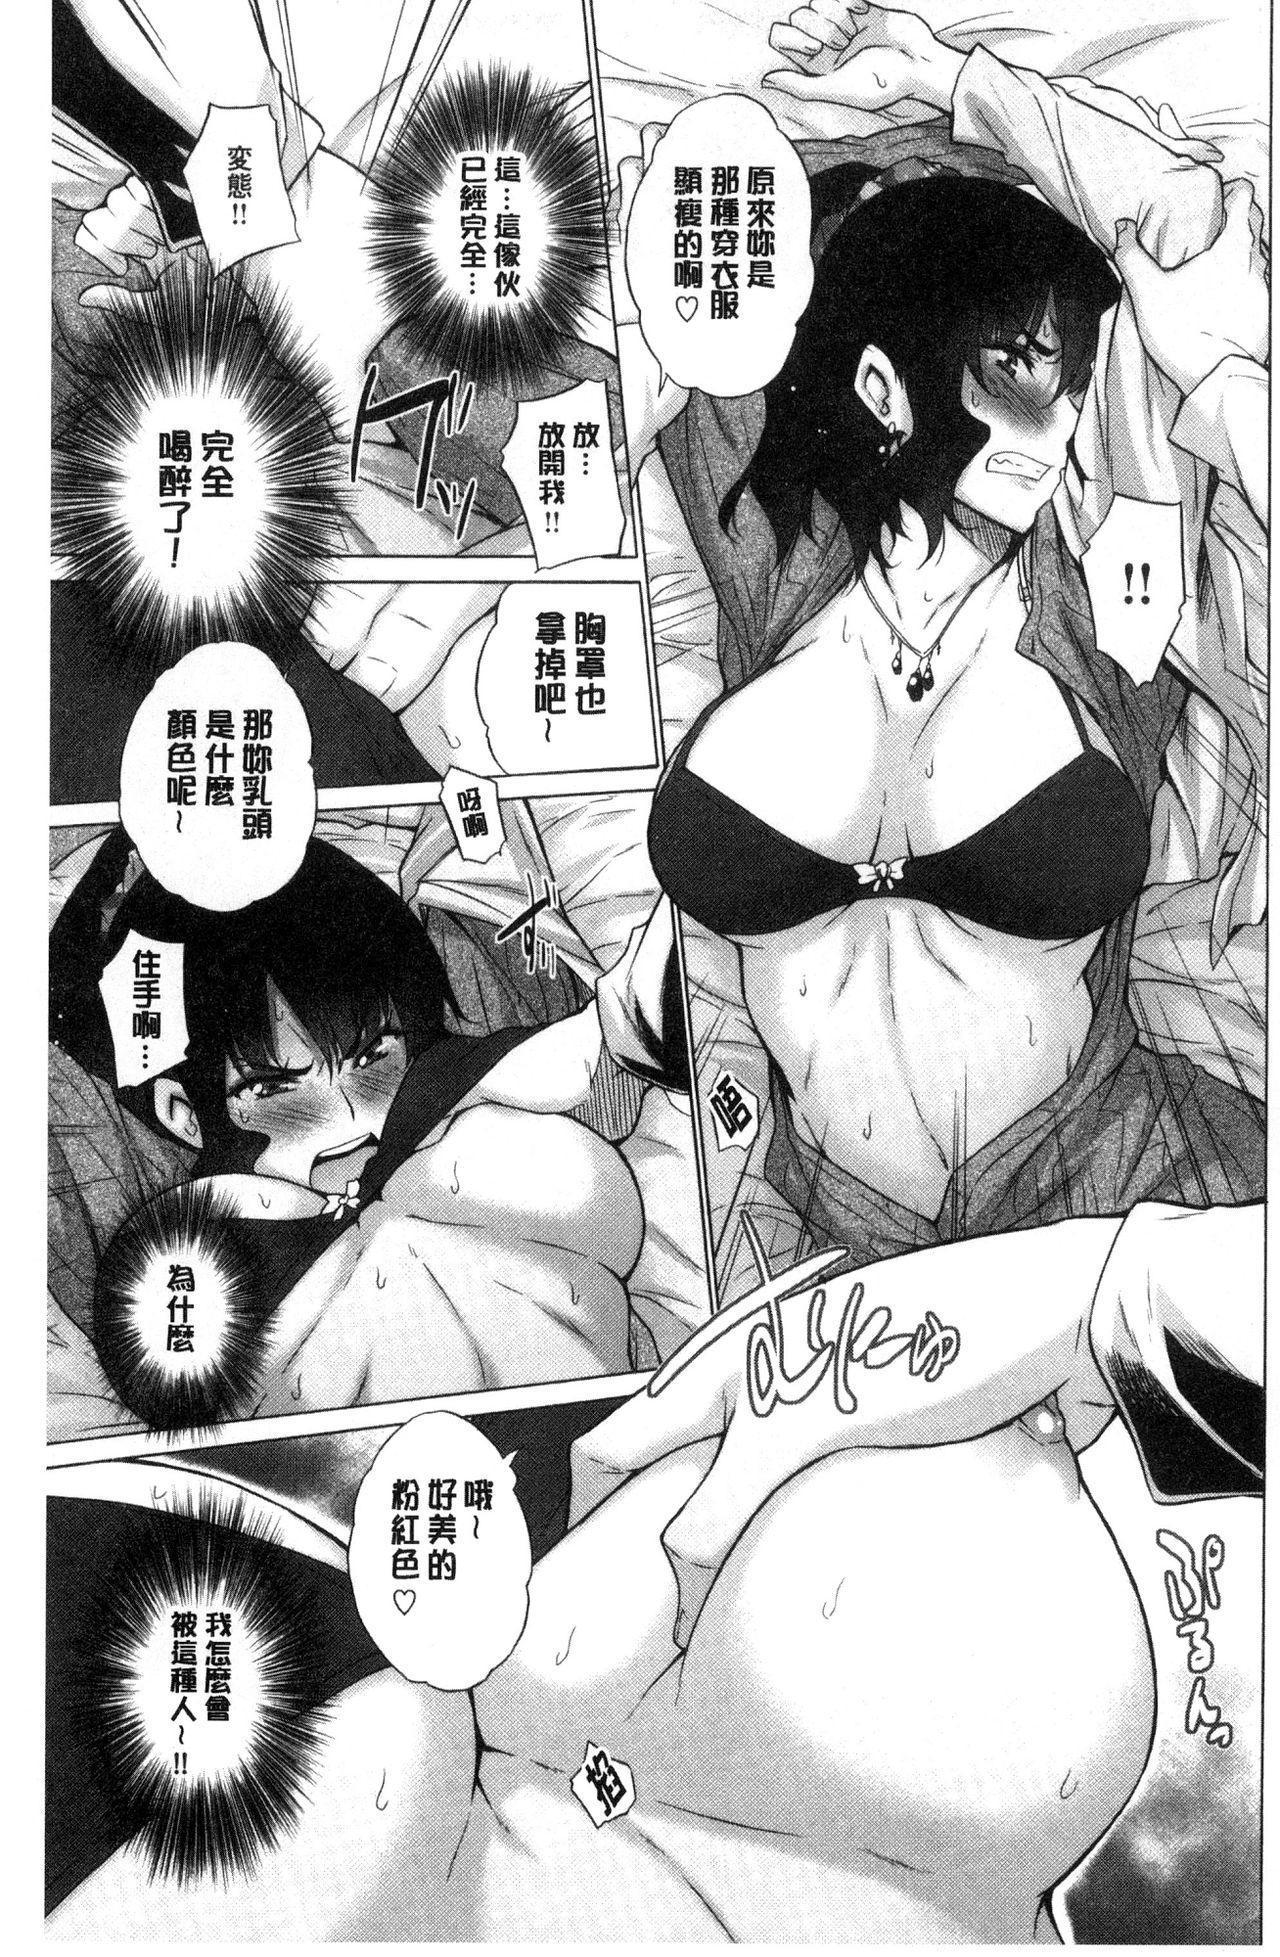 [Miyano Kintarou] Hishoujo List - The Non-Virgin List  | 非處女的名單 [Chinese] 196